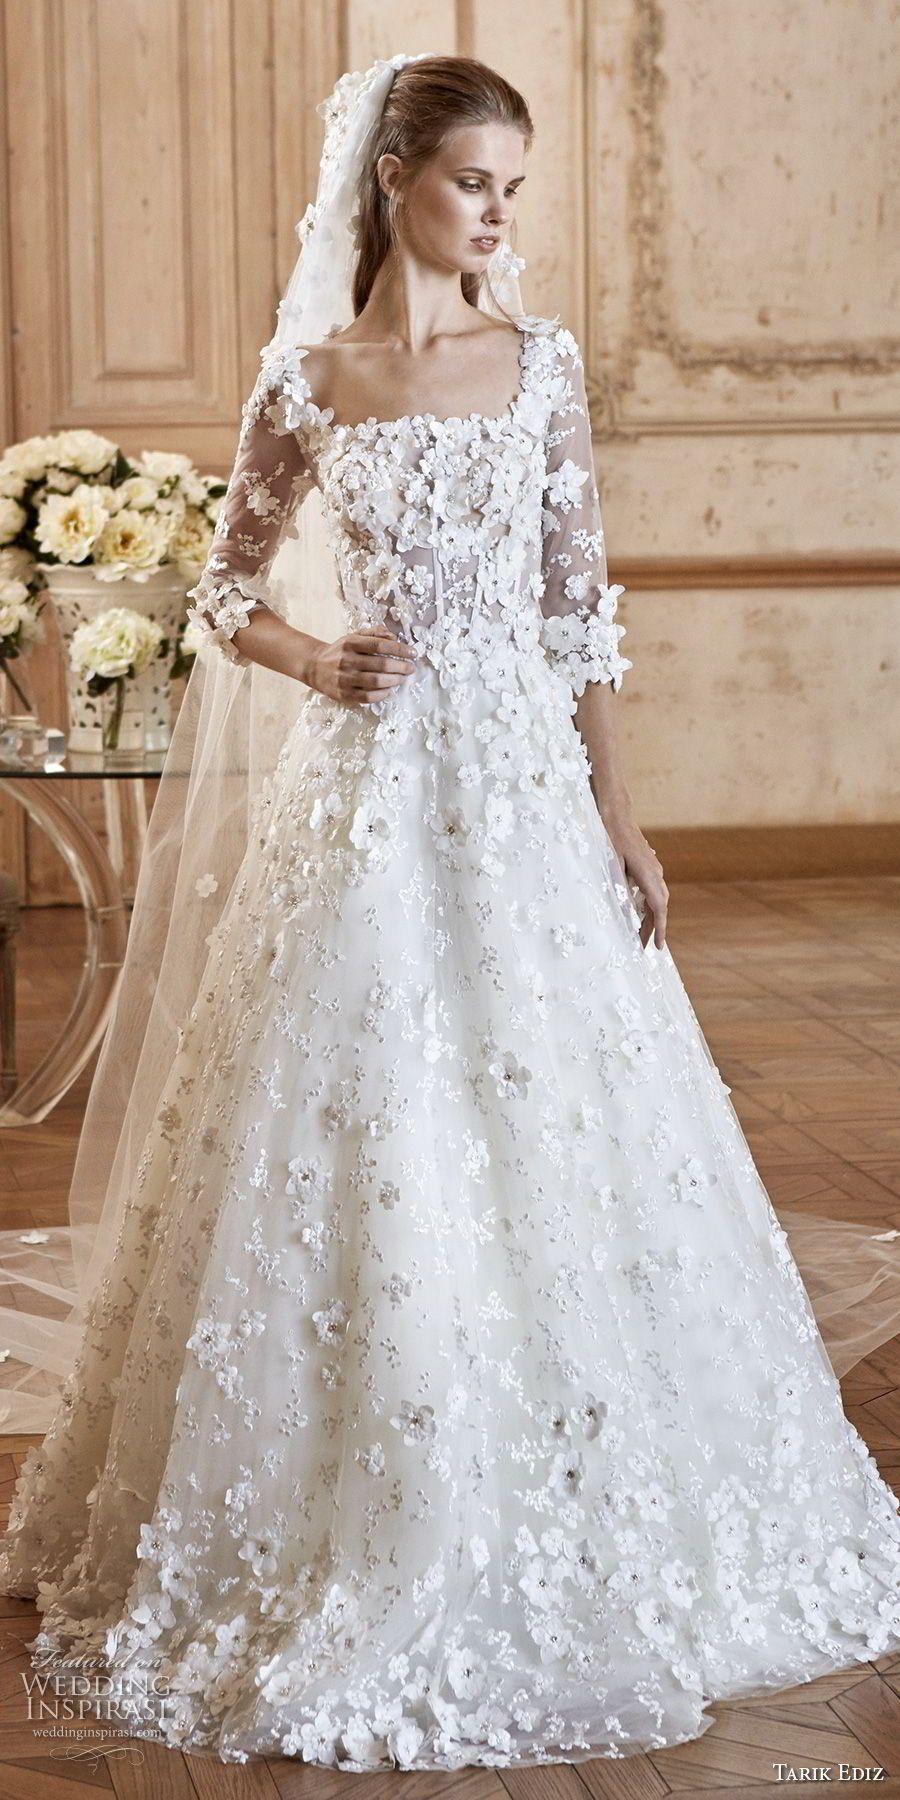 Tarik ediz white wedding dresses square necklines wedding